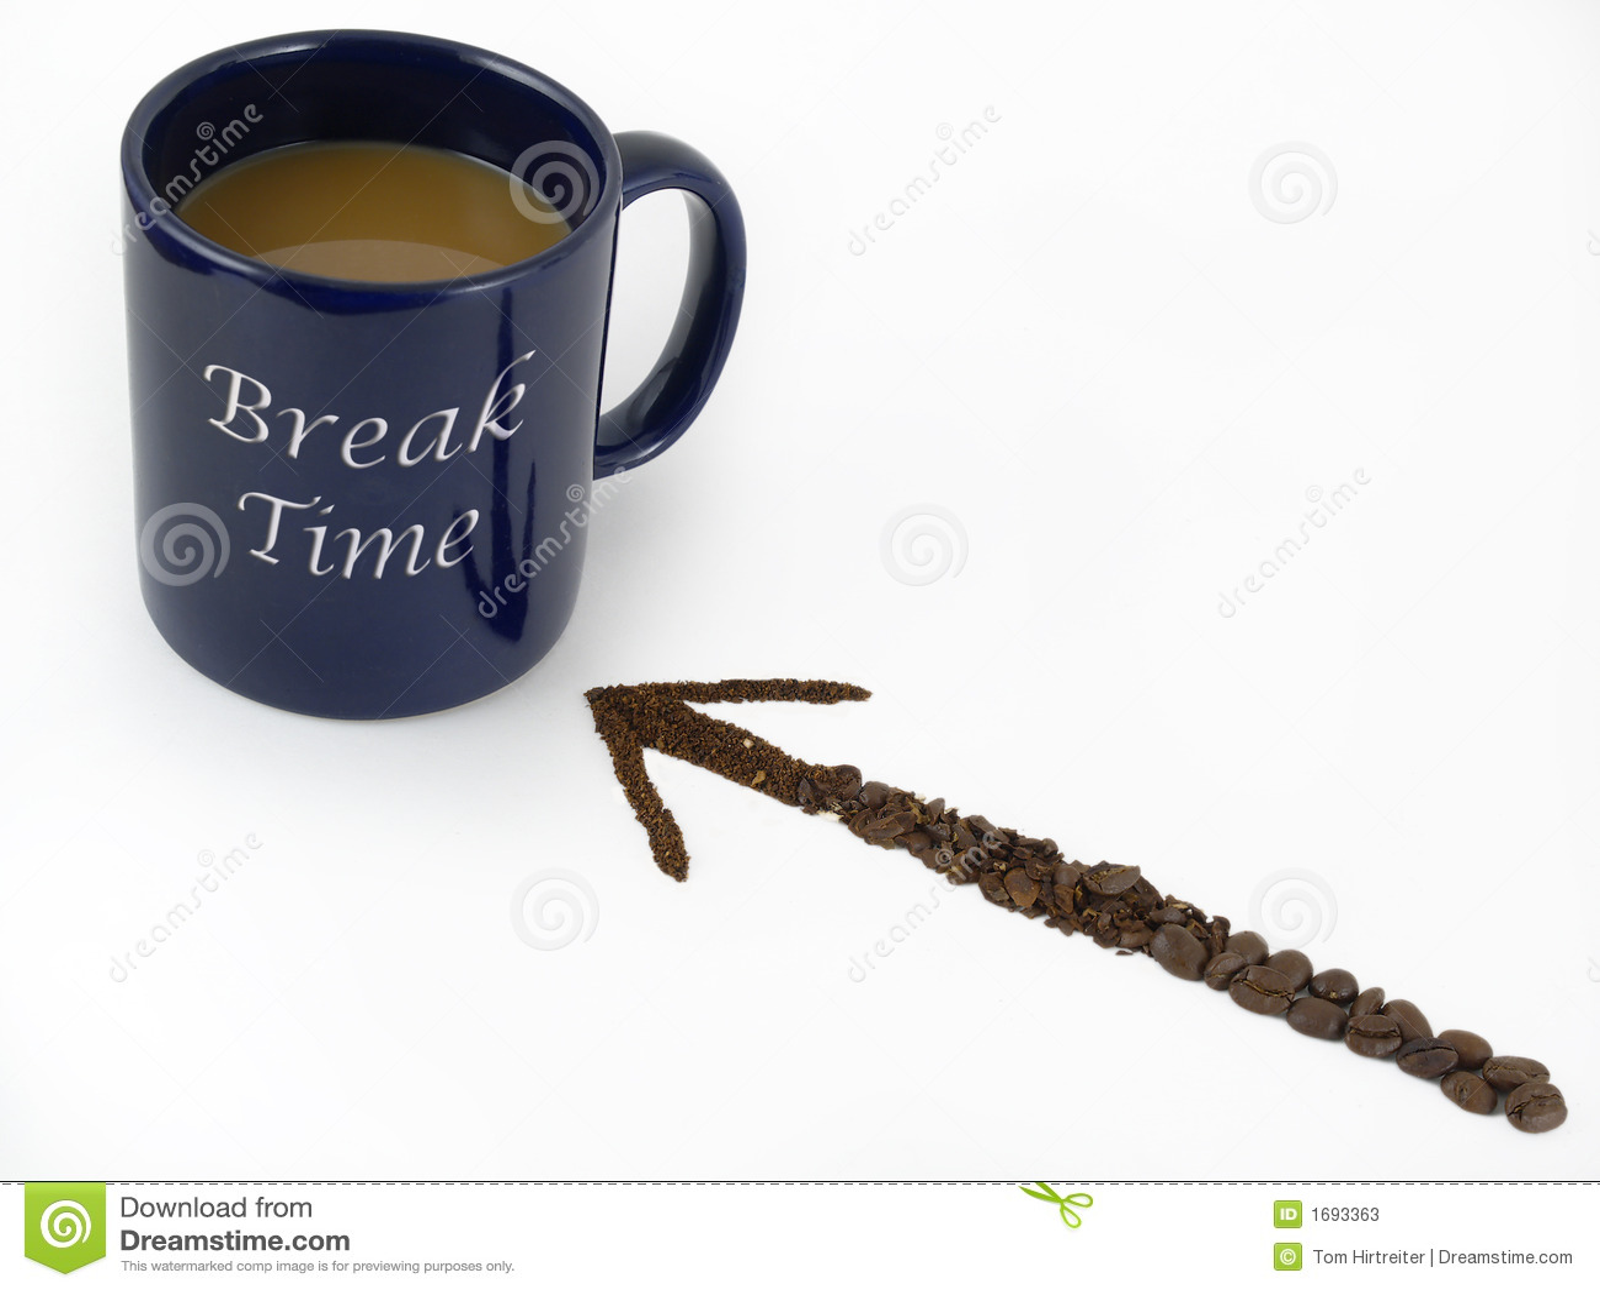 break time stock photos